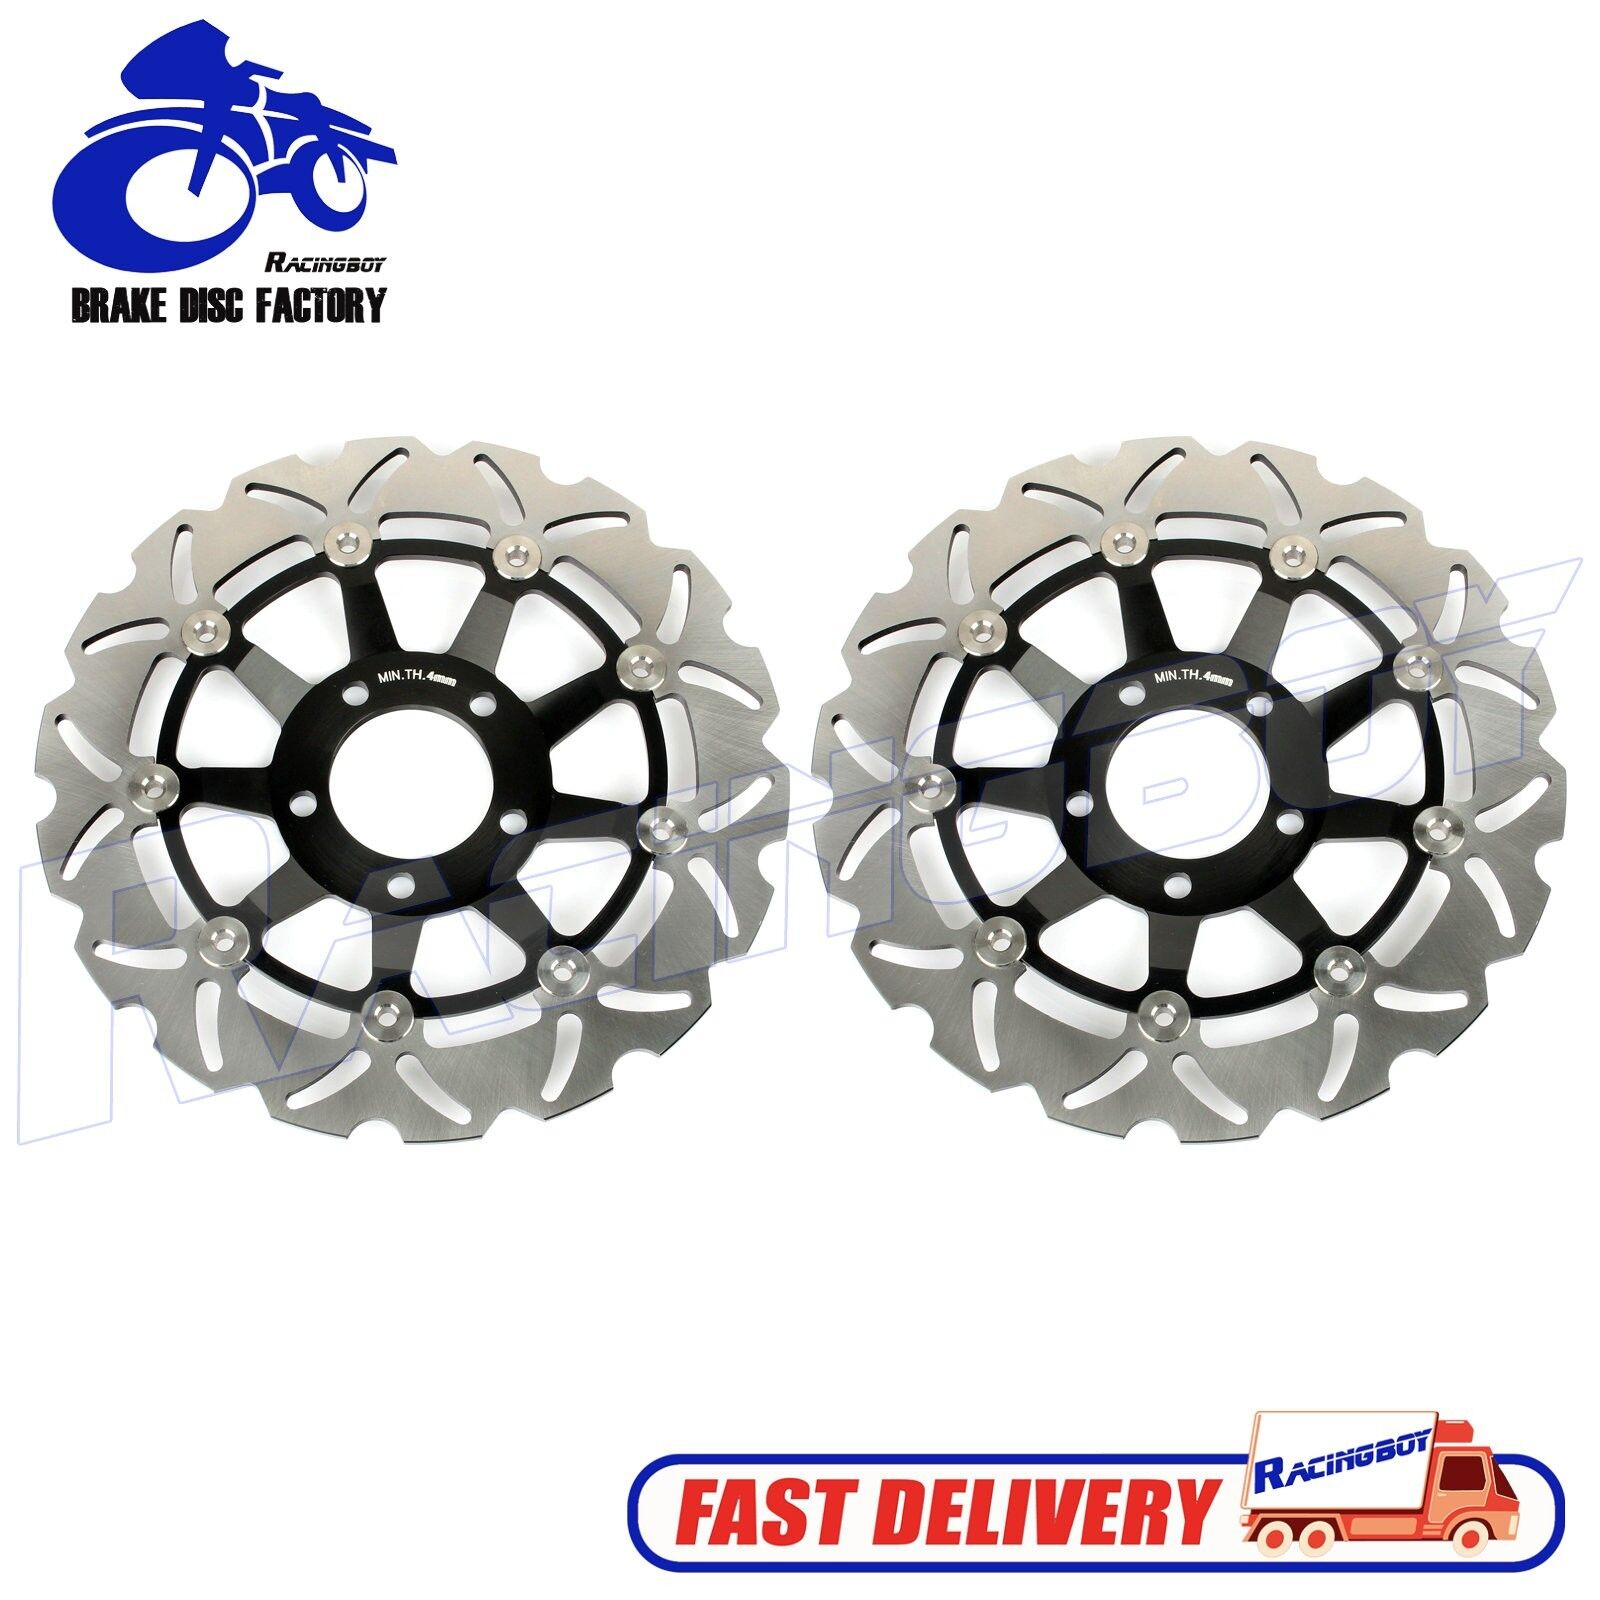 TARAZON 1 Pair Front Brake Discs Rotors for GSF 400 600 Bandit//GSX 750 F//GSX 400 Impulse//SV-S 650 99-02// RF400 R RV 95 96